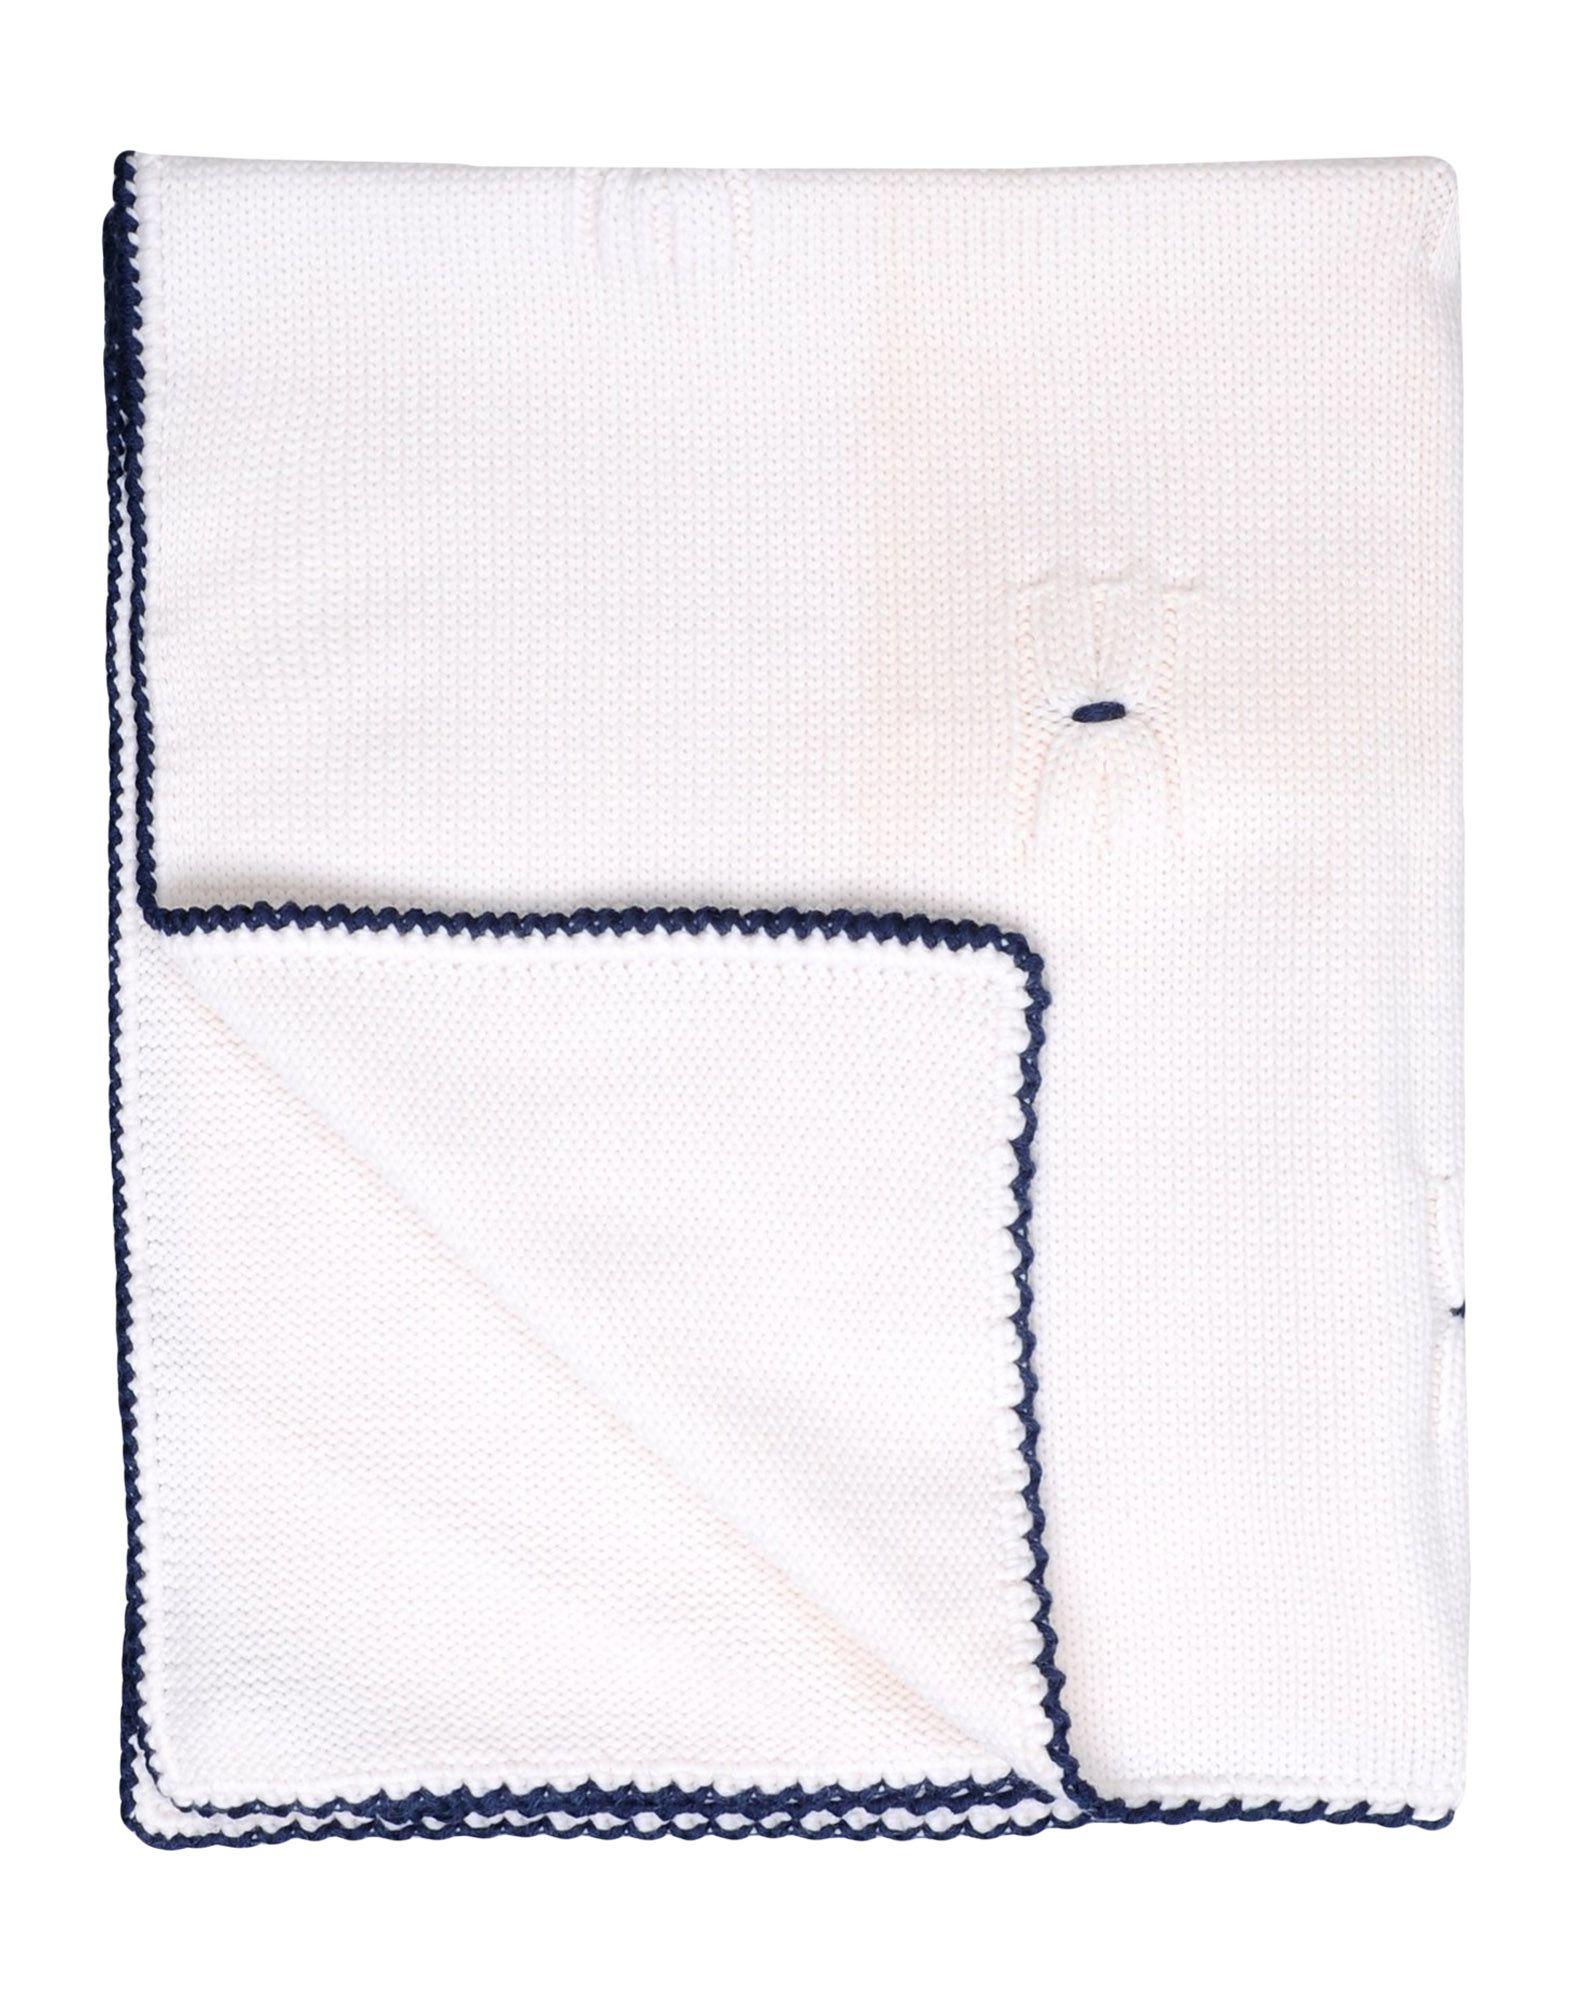 LITTLE BEAR Одеяльце для младенцев molo одеяльце для младенцев